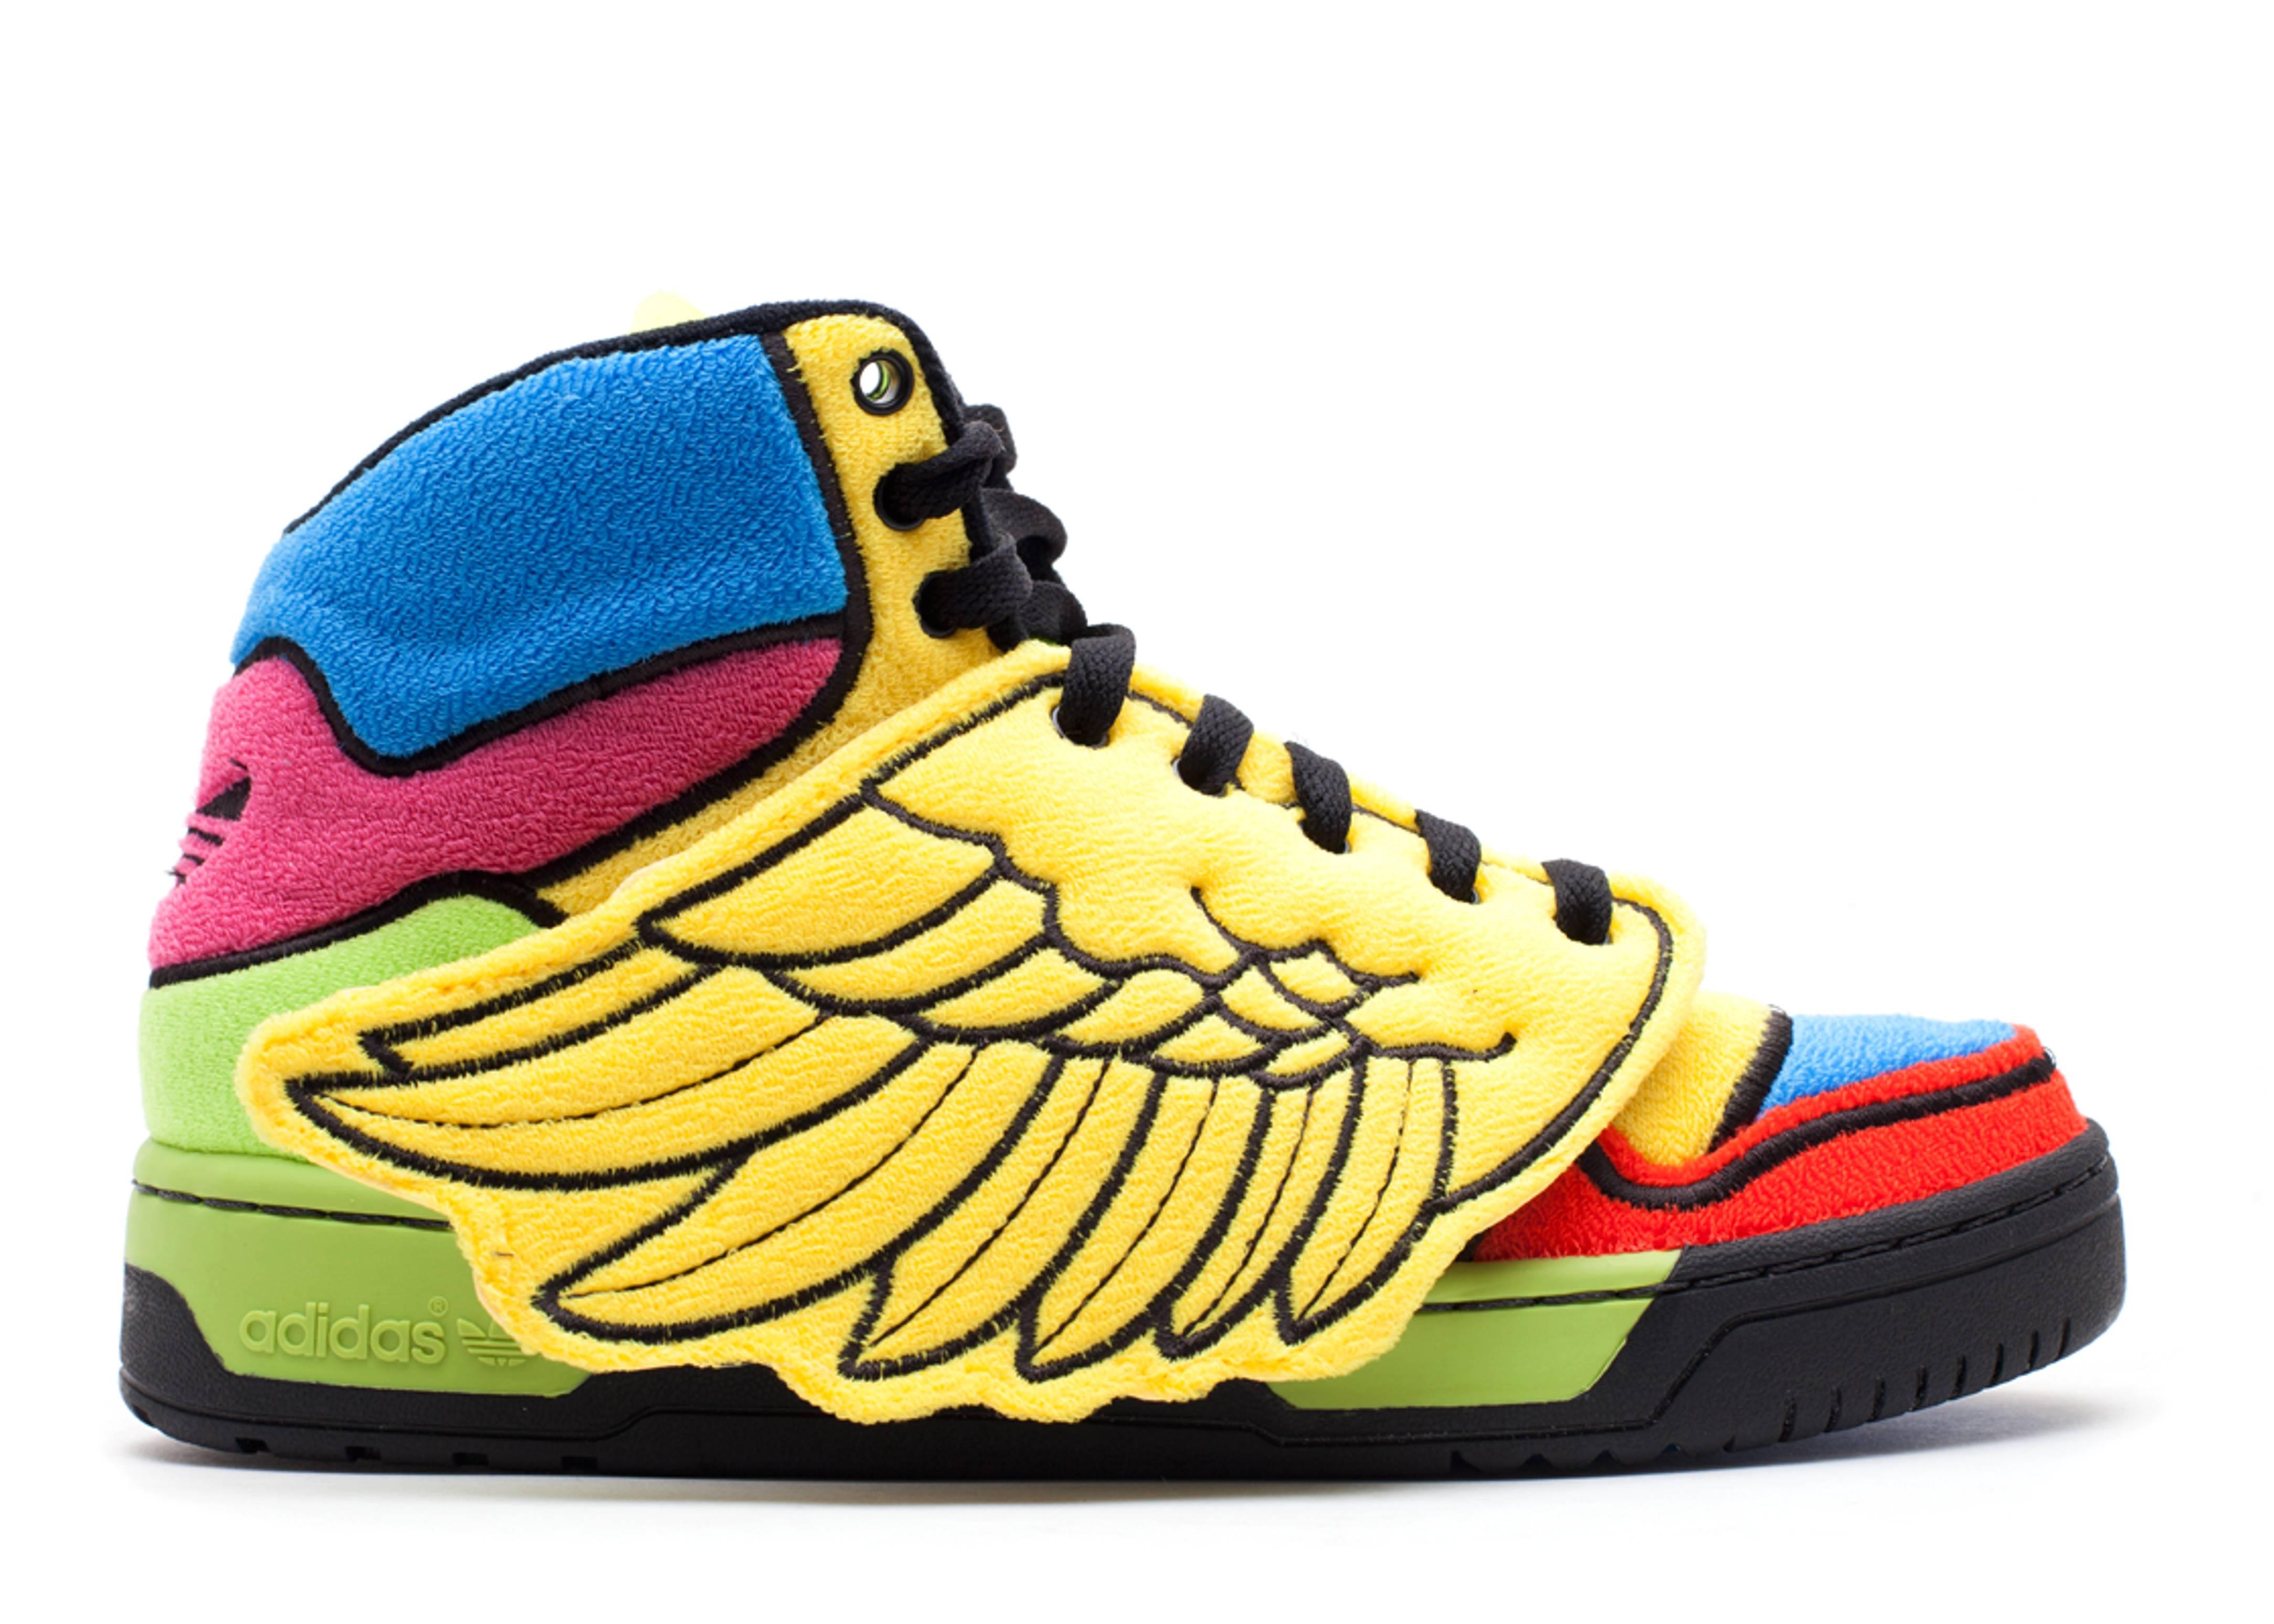 db1a7630d81f Js Wings